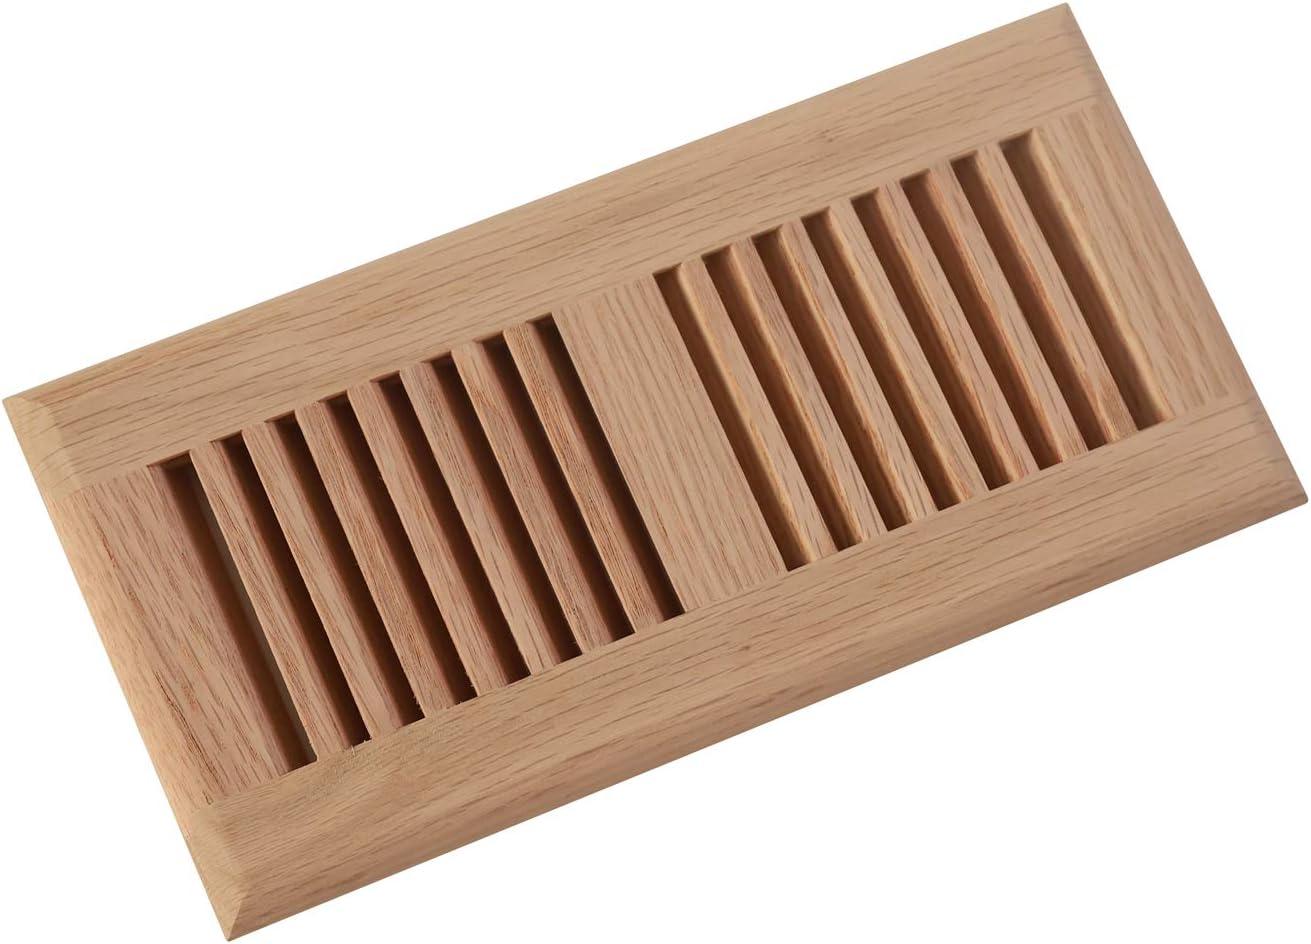 WELLAND 4 Inch x 10 Inch Red Oak Drop in Floor Register,Hardwood Vents Self Rimming,Unfinished.